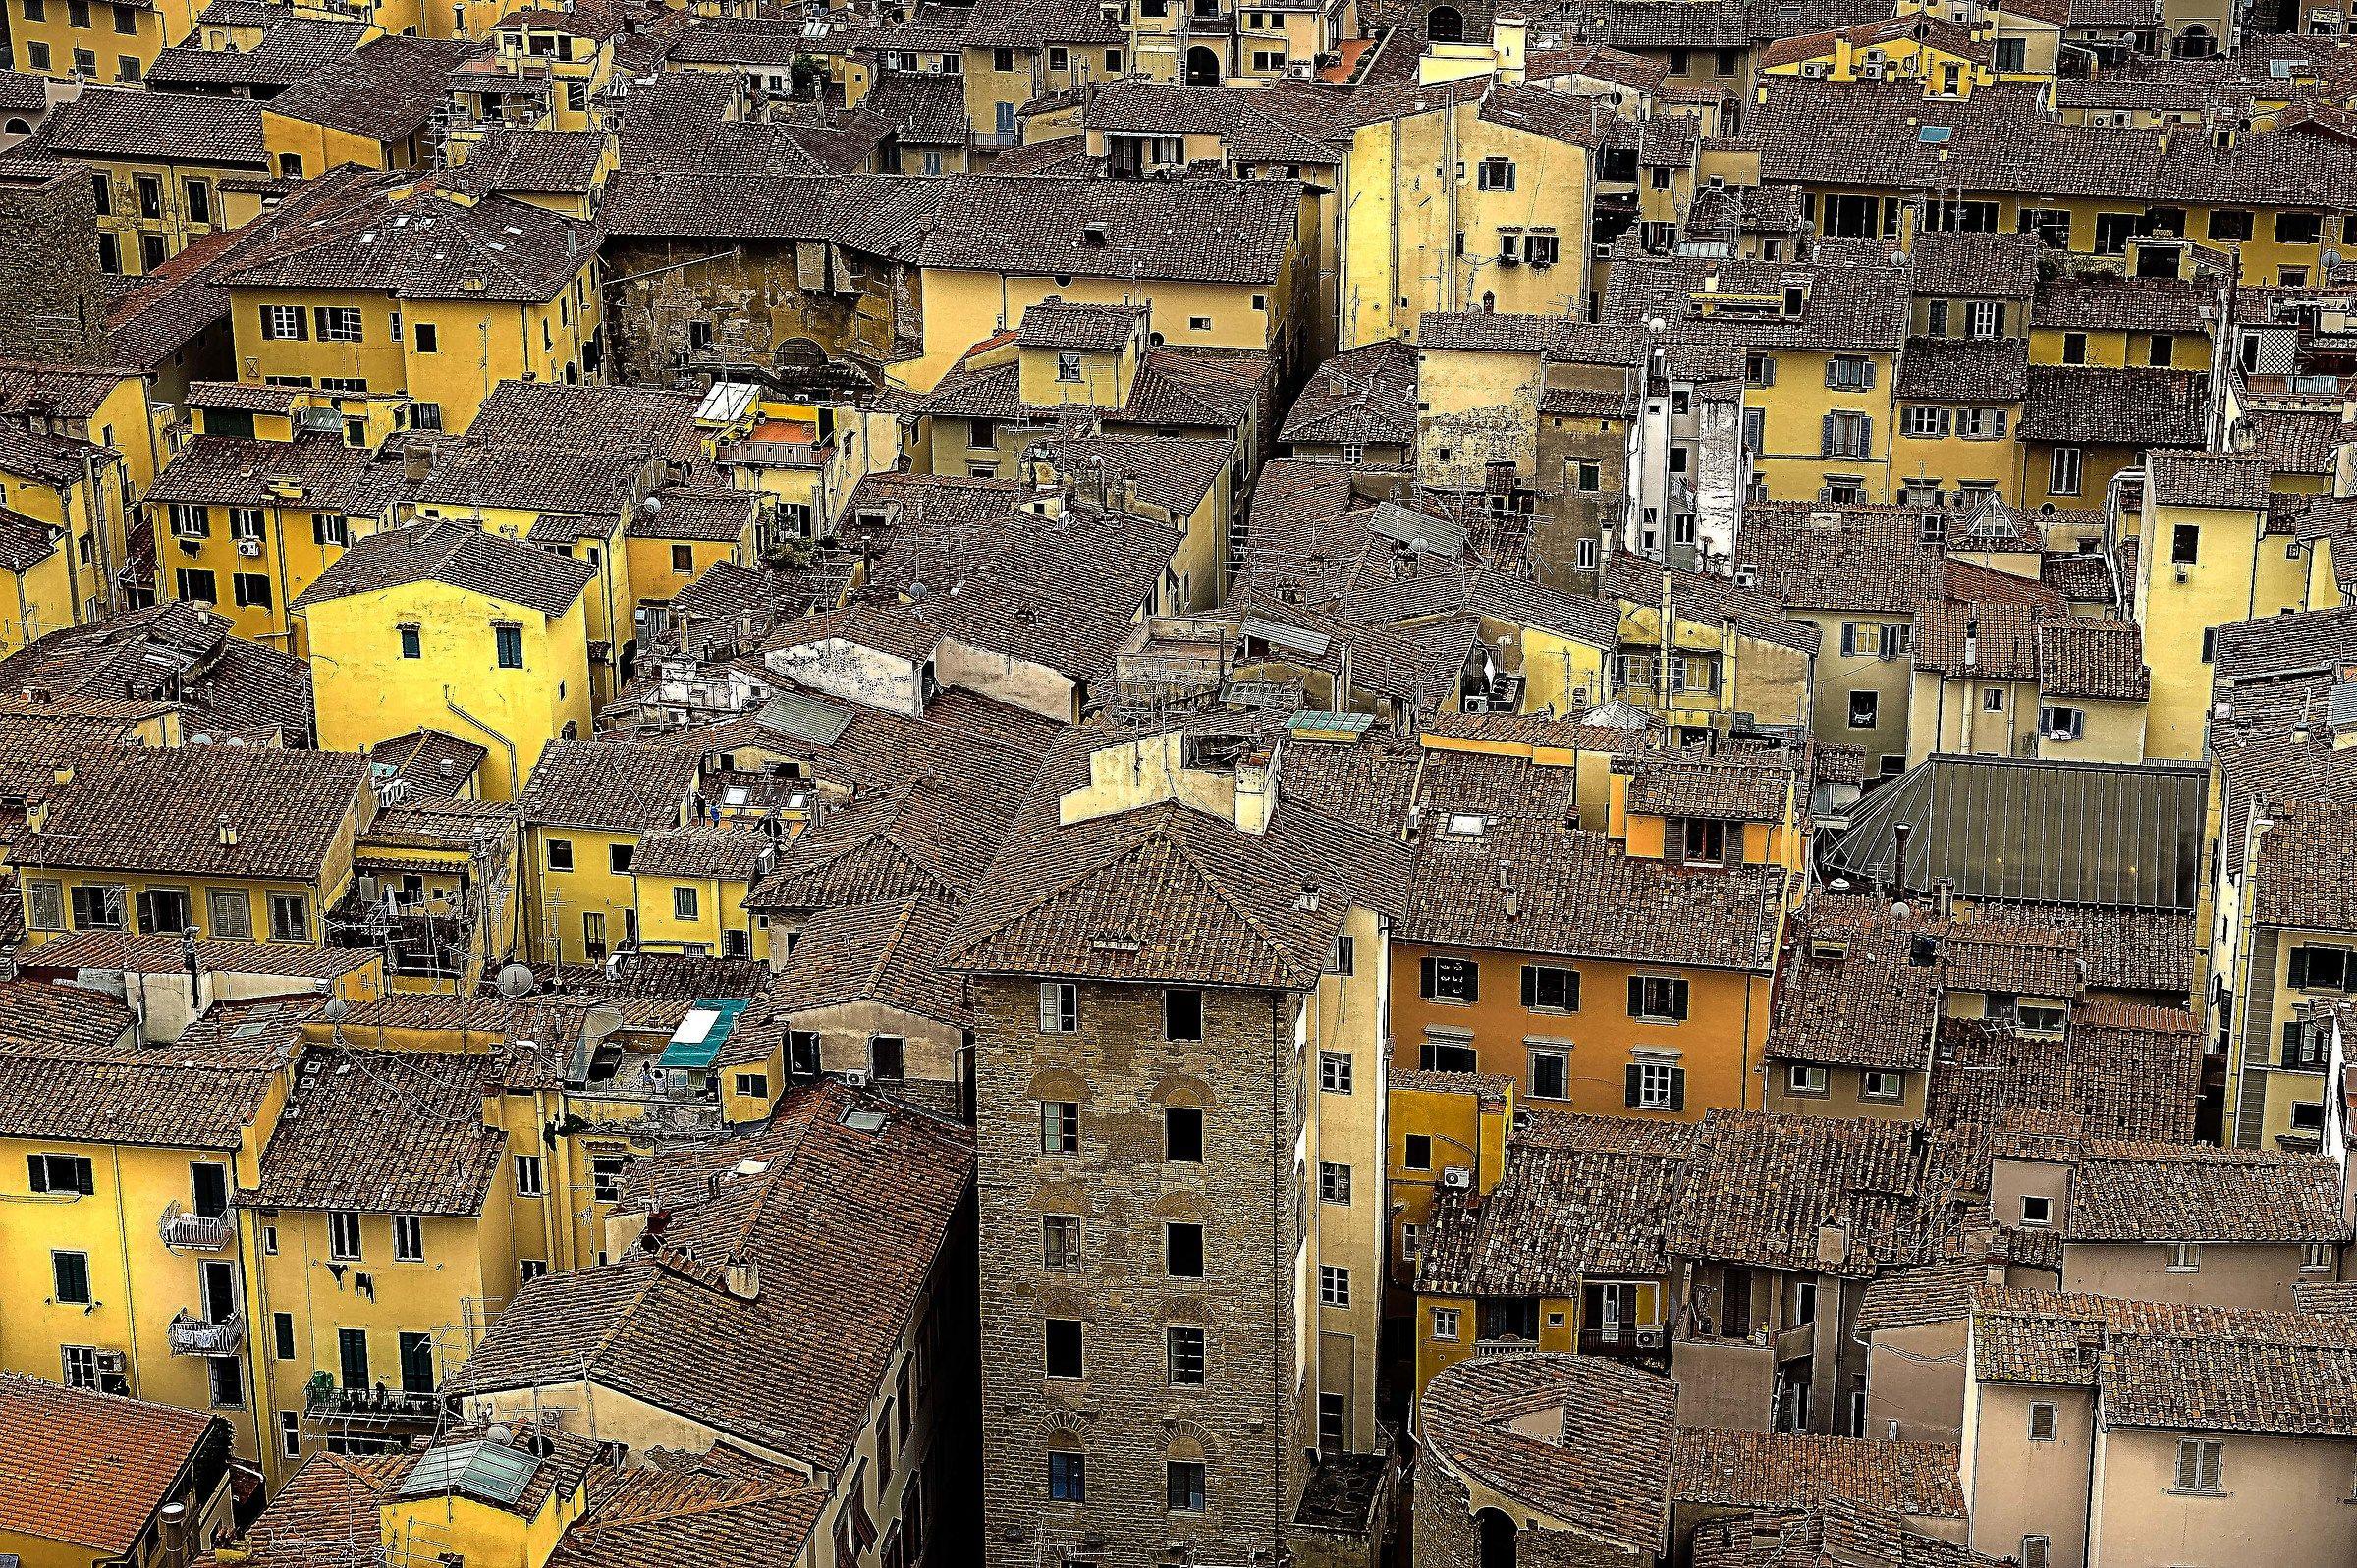 Florentine roofs...